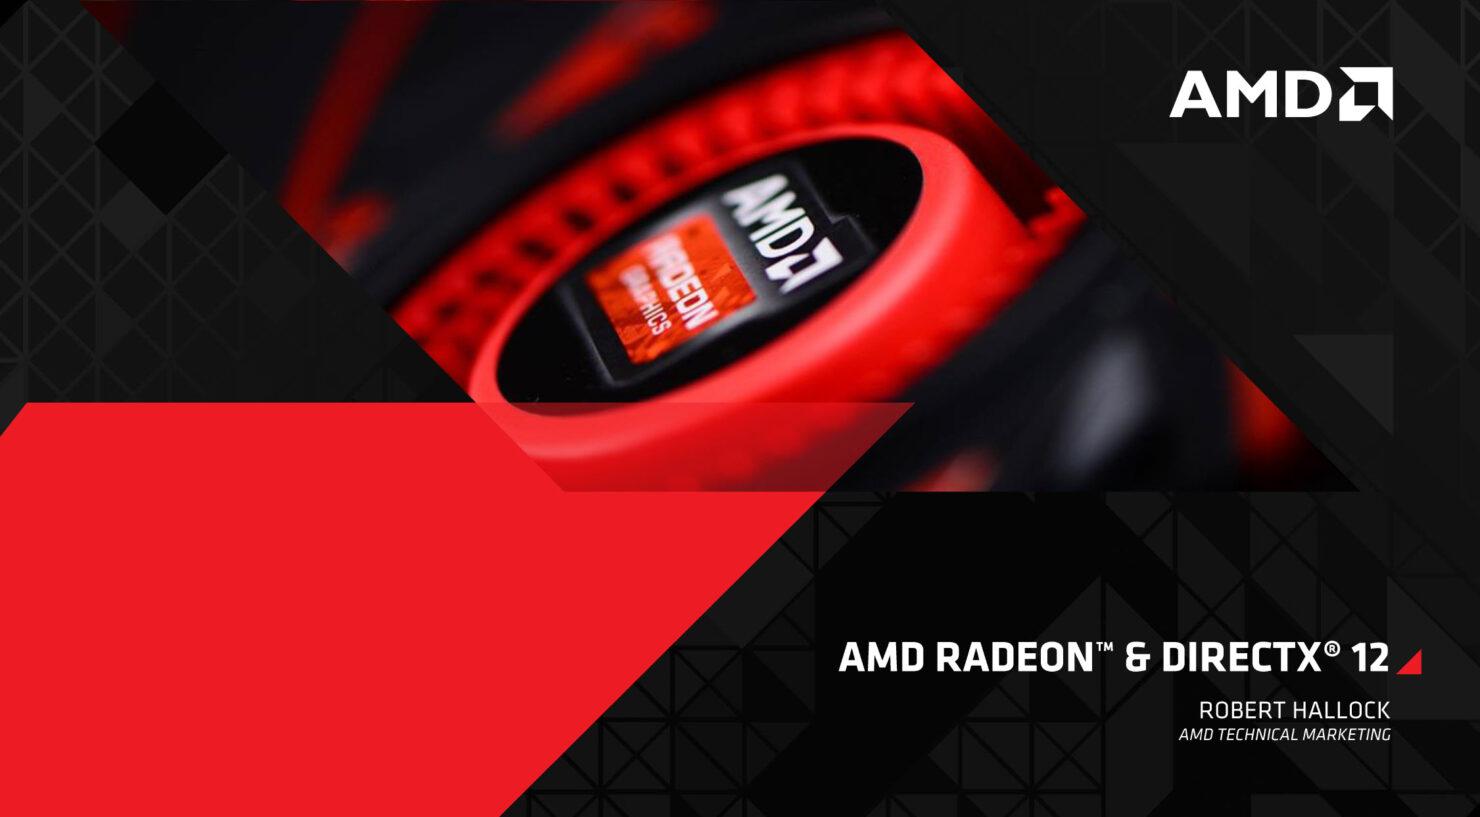 amd-radeon-and-directx-12